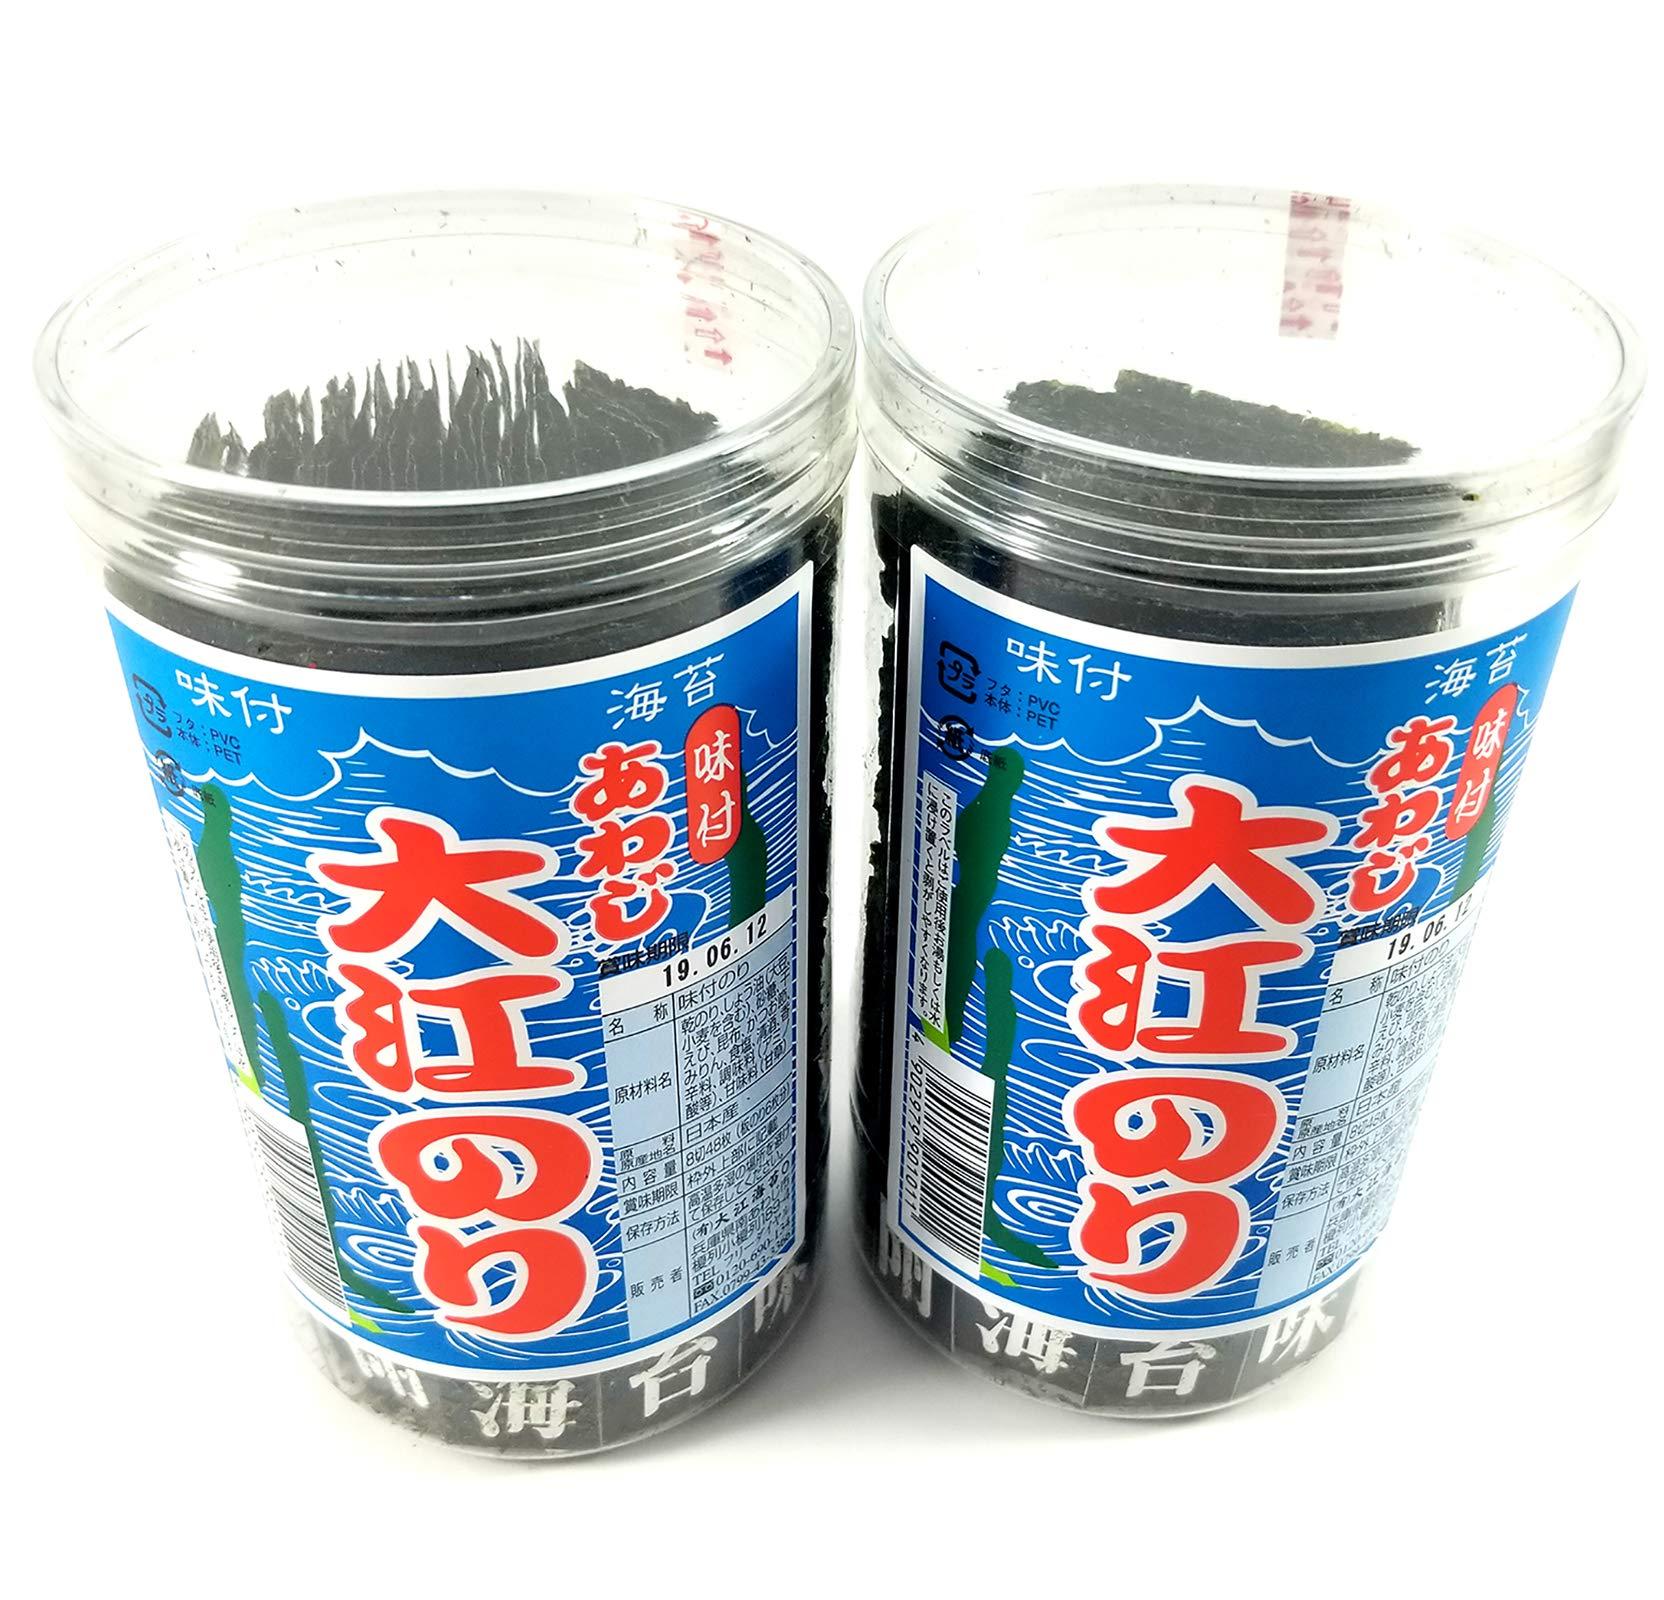 DOUNGURI Awaji Oe Nori - Organic Natural Gluten Free Seaweed Strip Sheets Snack Pack with Sea Salt and Kelp I 48 Counts I Crispy, Flavorful, Low Calorie, Healthy, Vegan, No MSG (2) by Dounguri (Image #1)